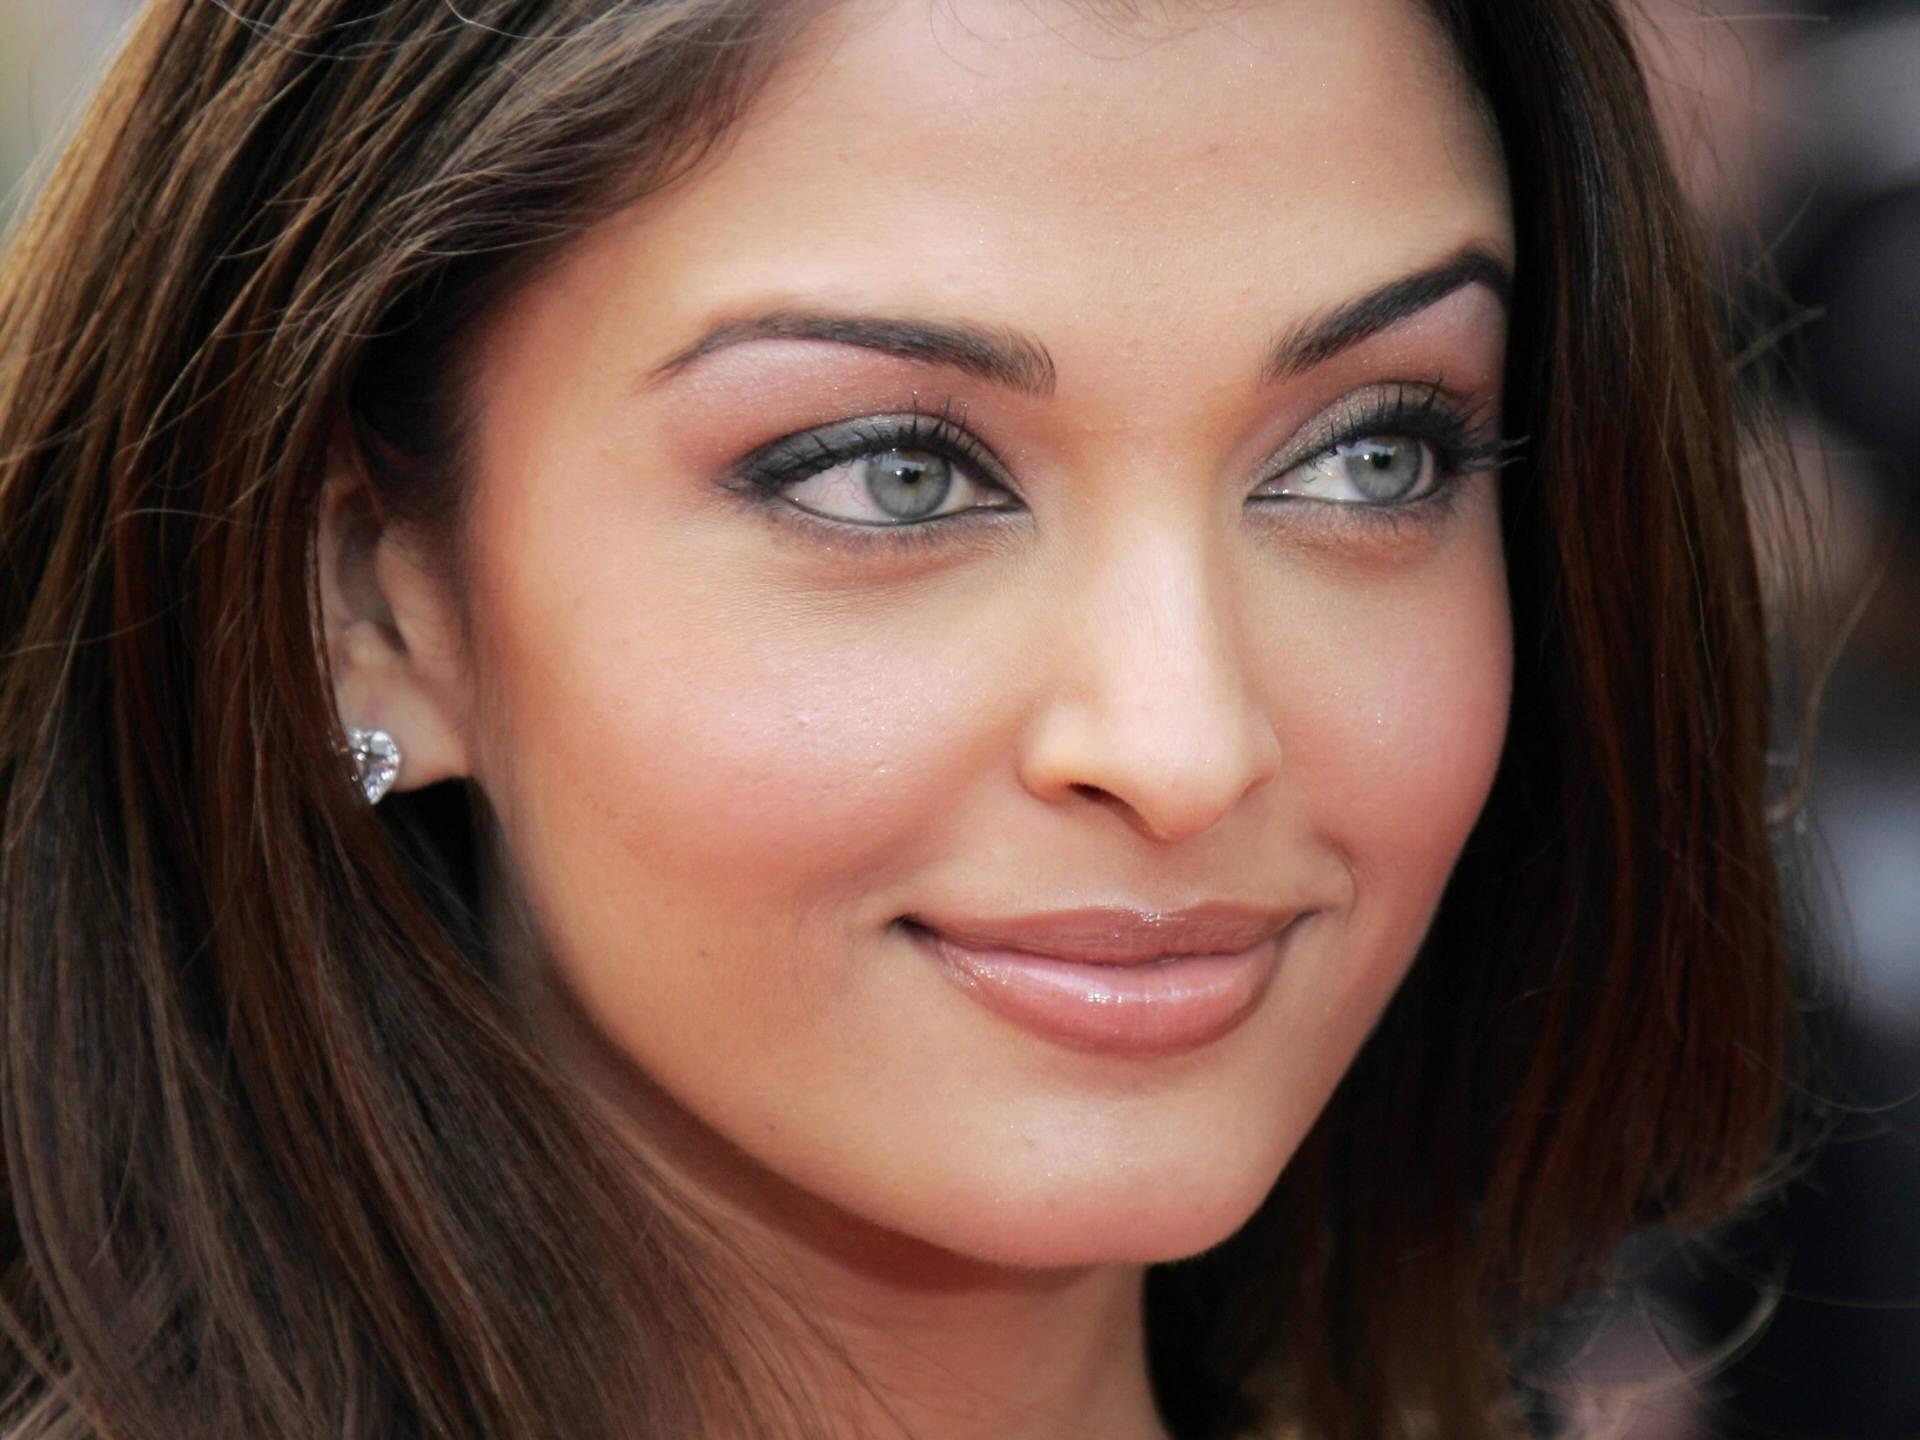 Aishwarya Rai Smile Wallpaper Aishwarya Rai Female celebrities